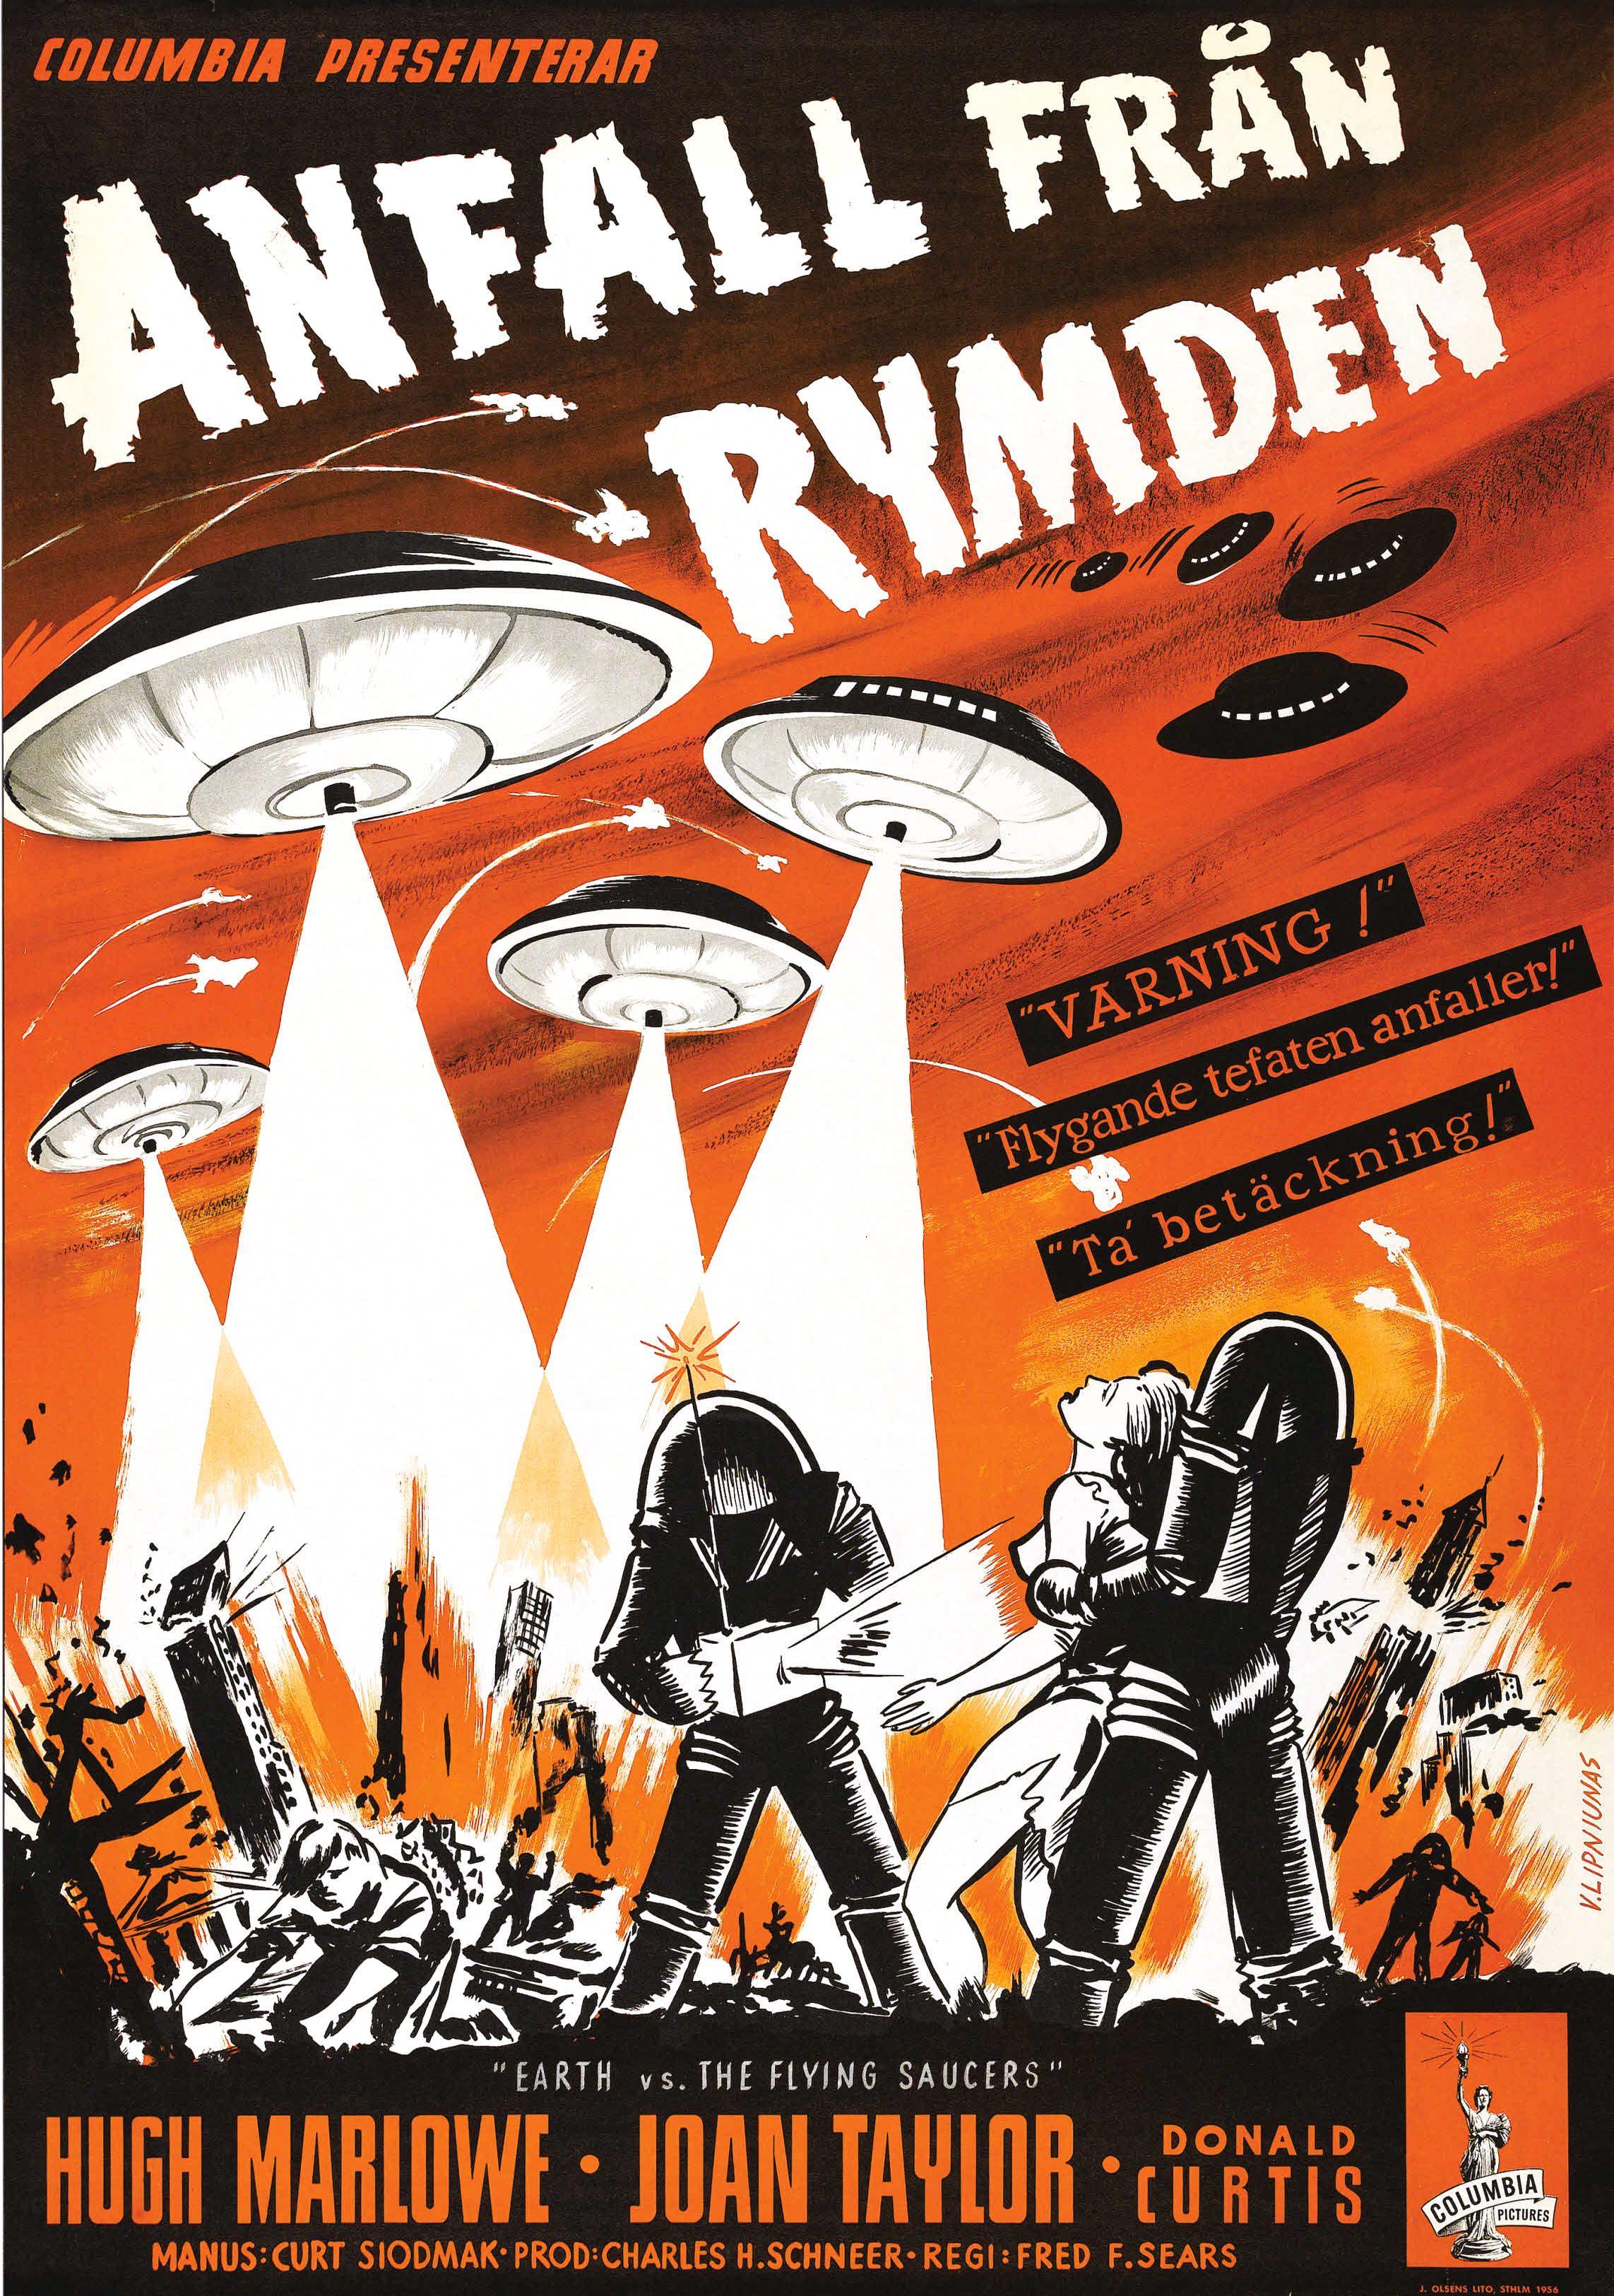 Happy Birthday, Ray Harryhausen! | Spectacular Attractions